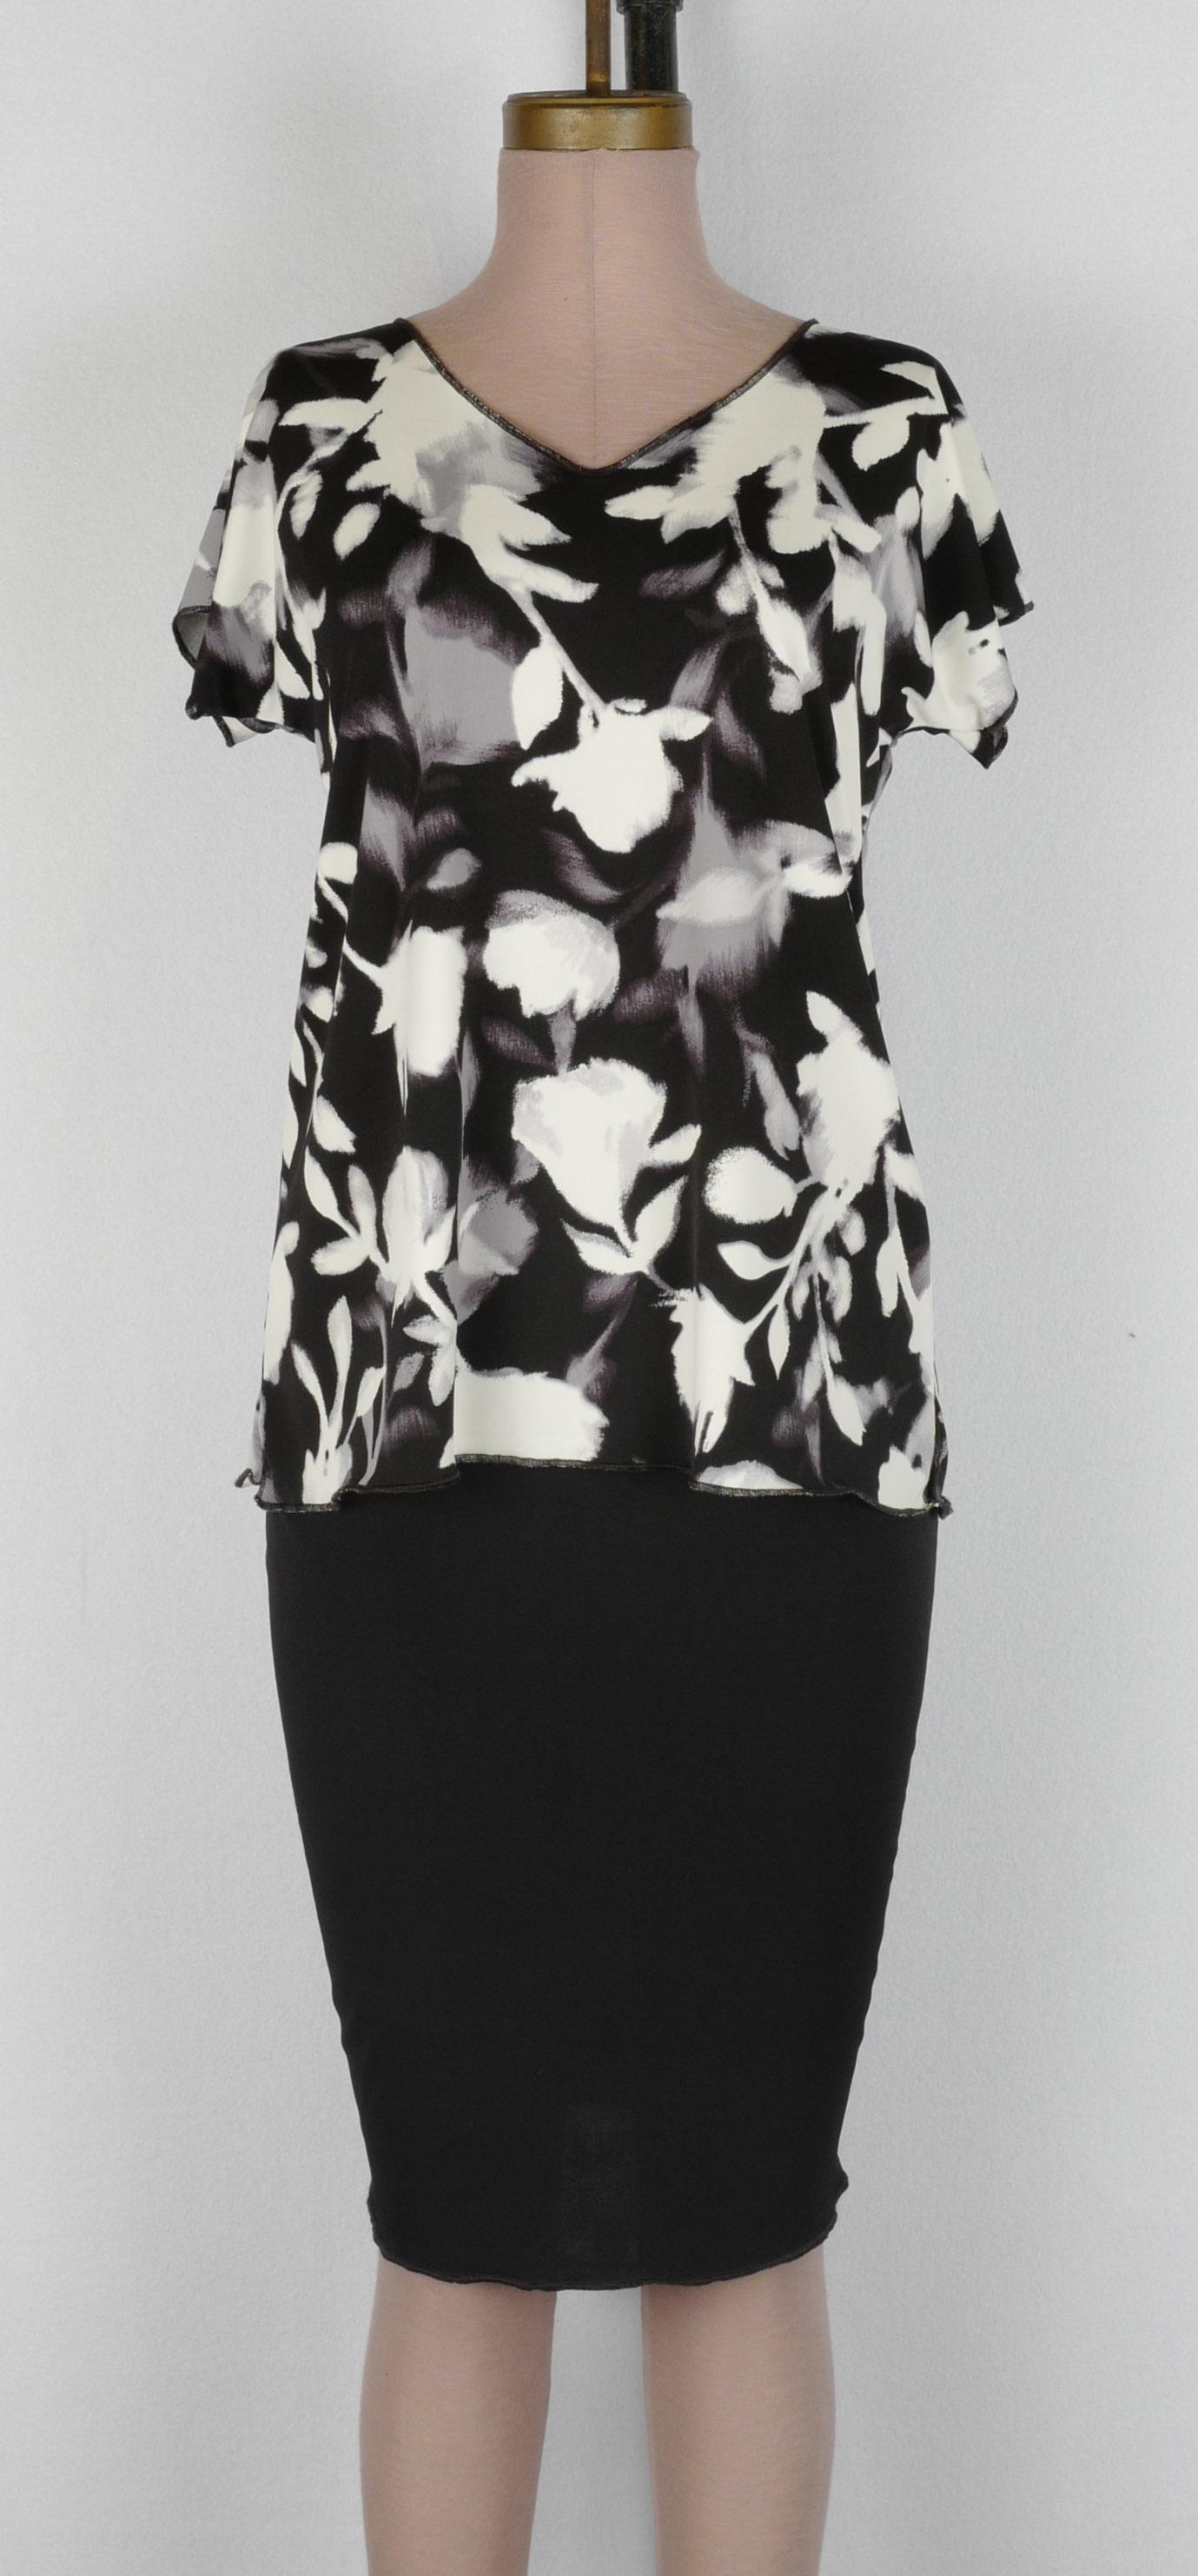 Black White Floral Cap T 2019 cropped.jpg